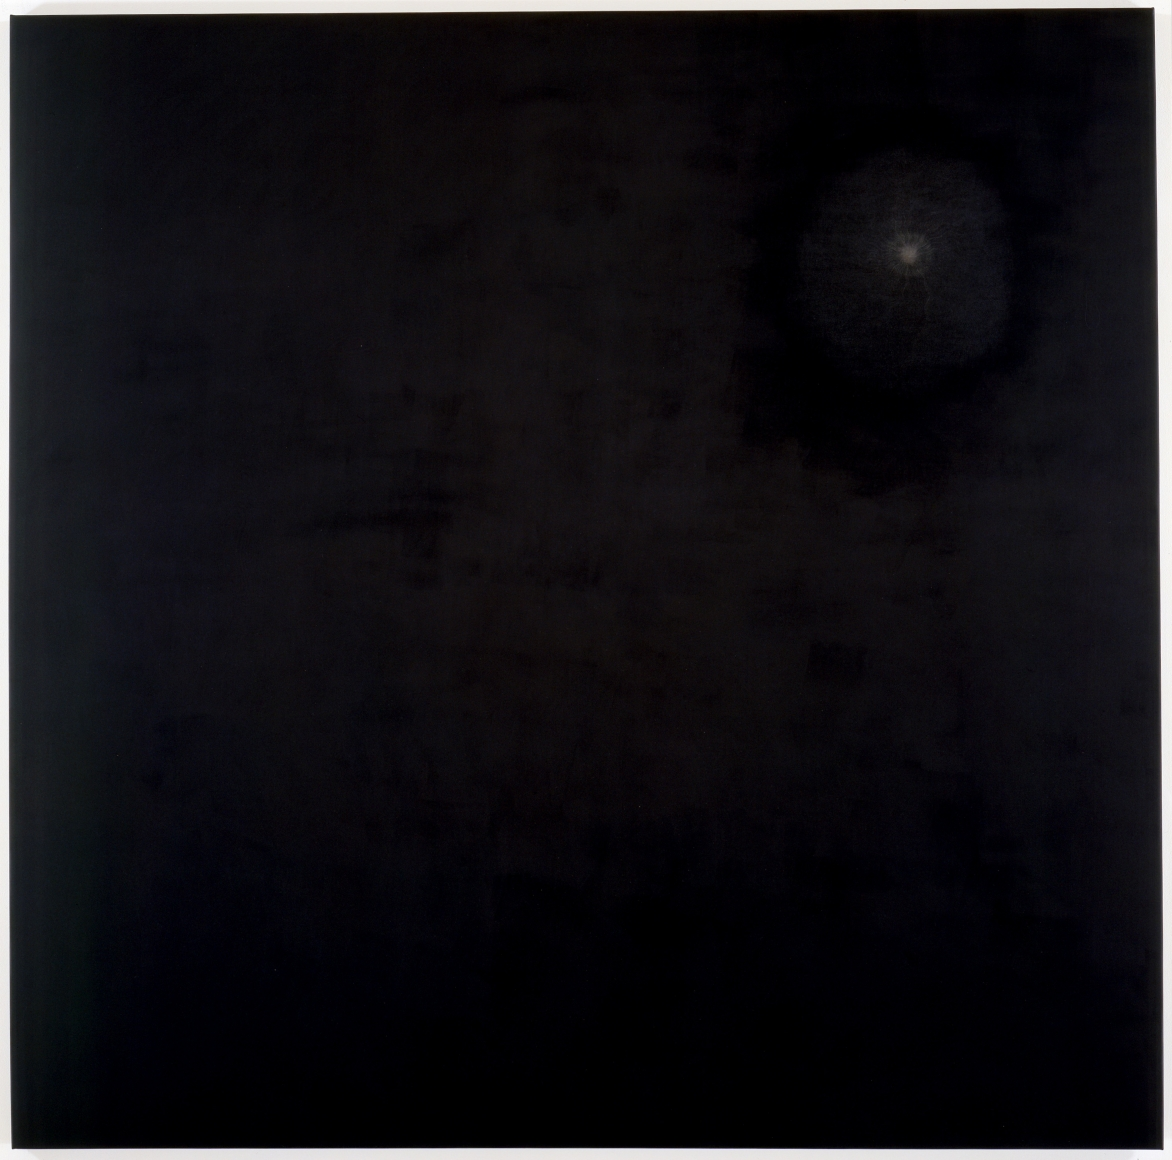 SHIRAZEH HOUSHIARY, Black light, 1998